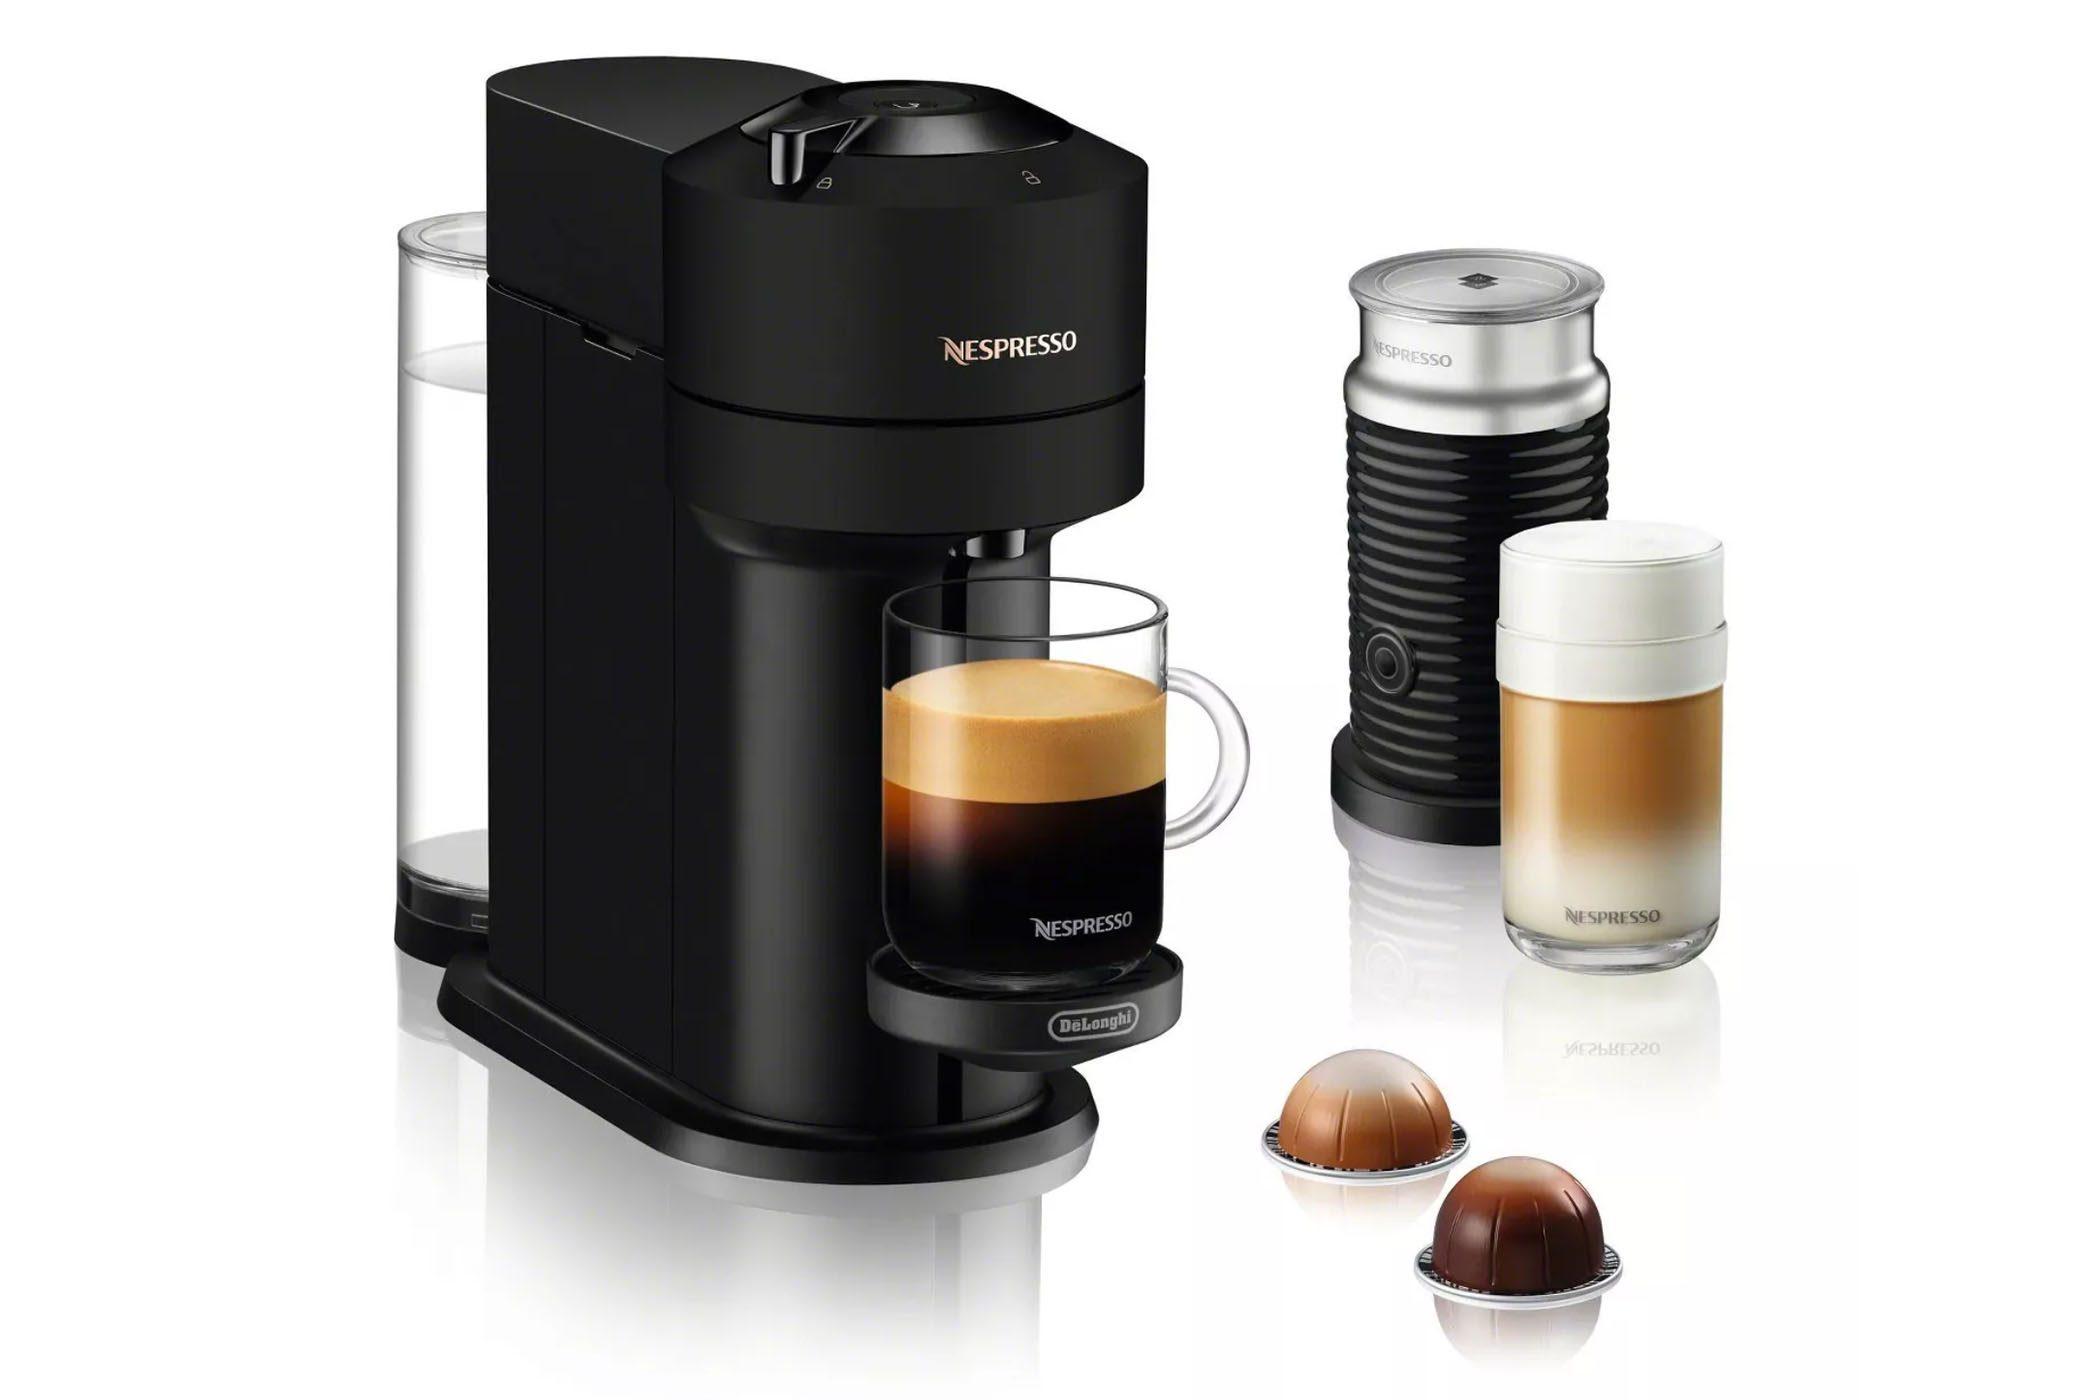 Nespresso Vertuo Next Coffee and Espresso Machine Bundle by De'Longhi - Limited Edition Black Matte